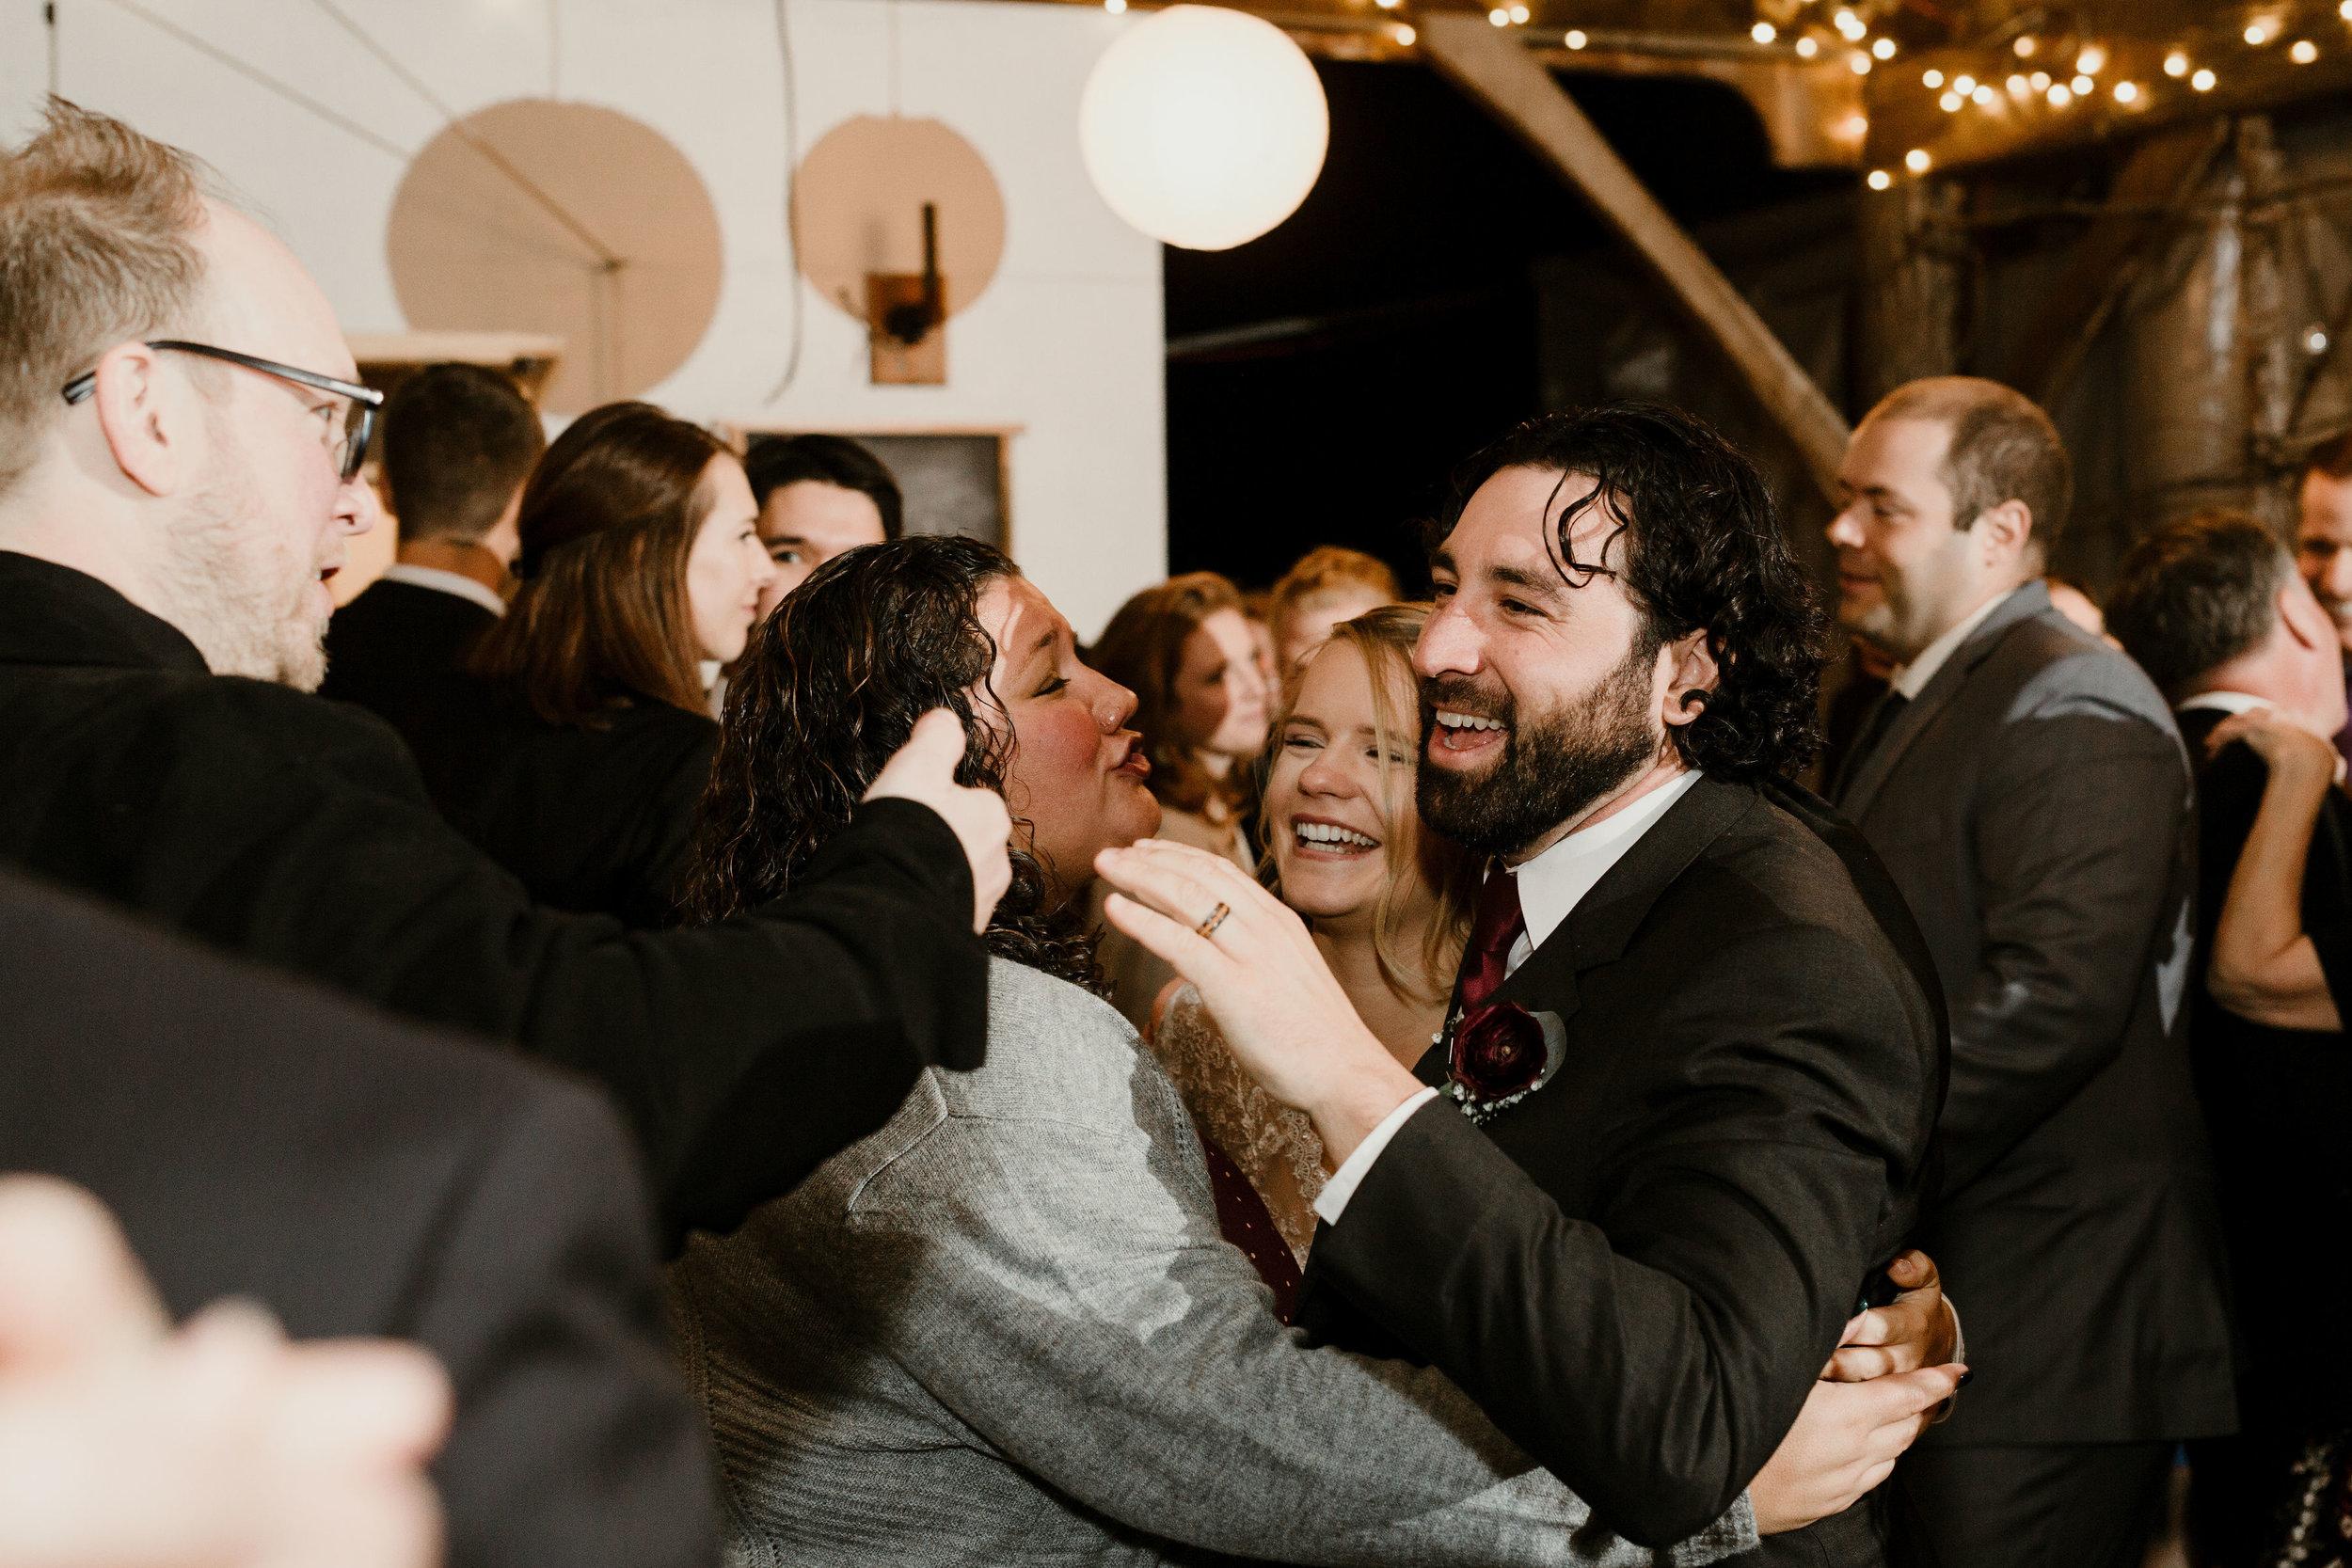 young-love-media-rustic-fall-autumn-wedding-emmerich-tree-farm-hudson-valley-warwick-new-york-reception-87.jpg